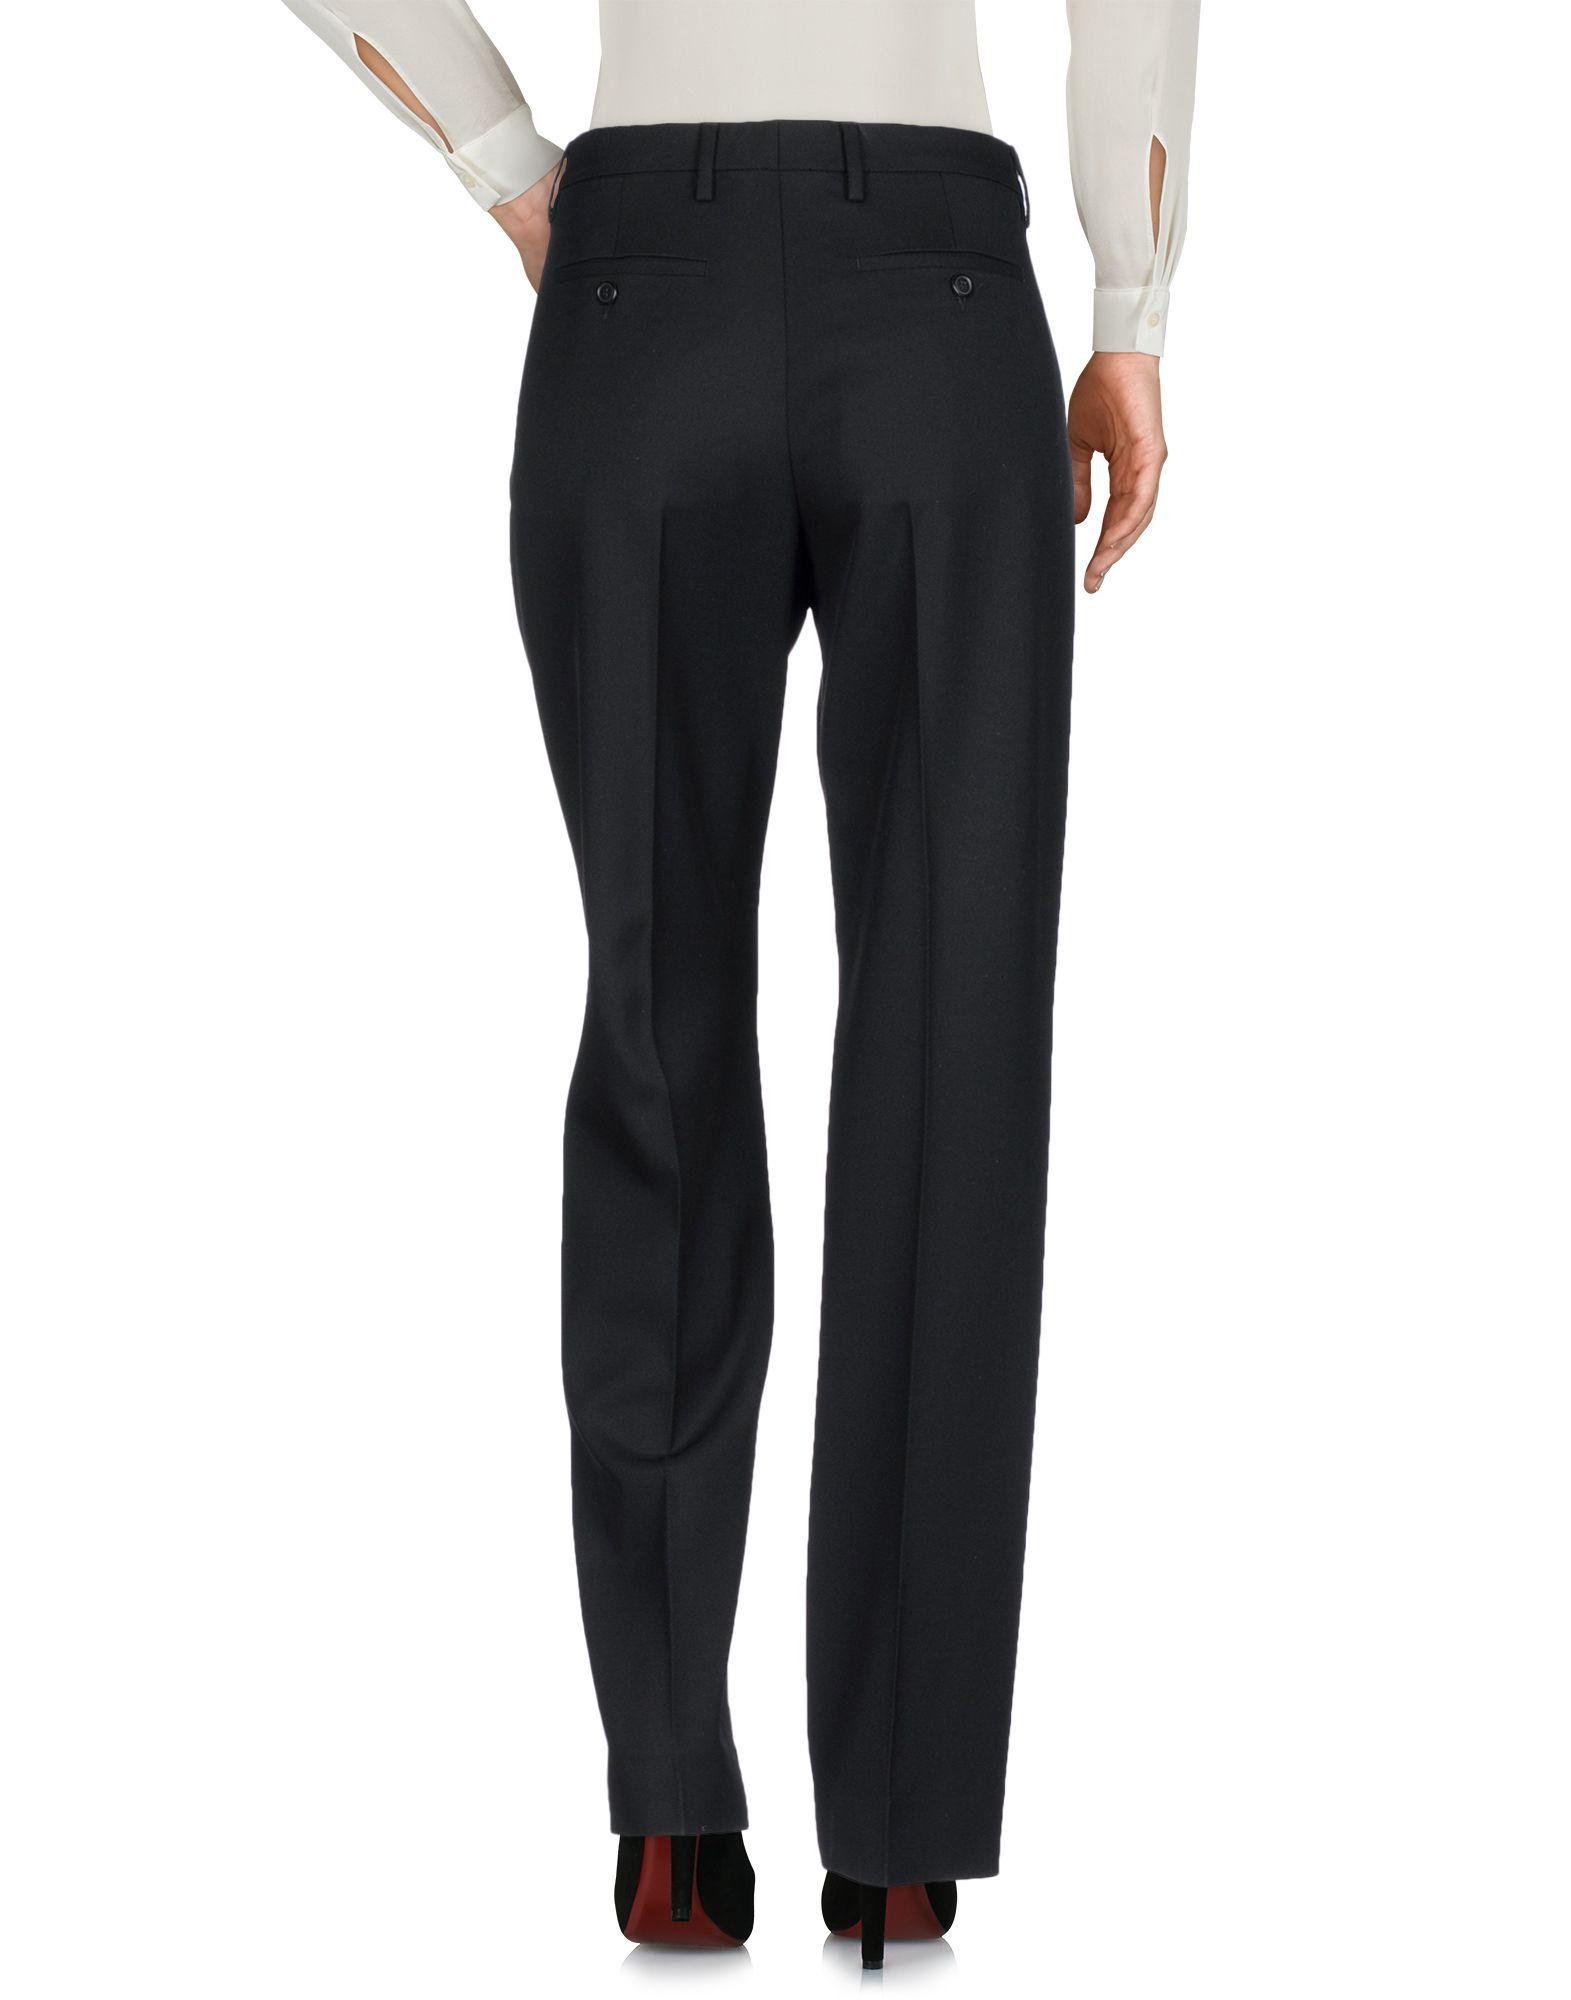 Maison Margiela Black Virgin Wool Tailored Trousers